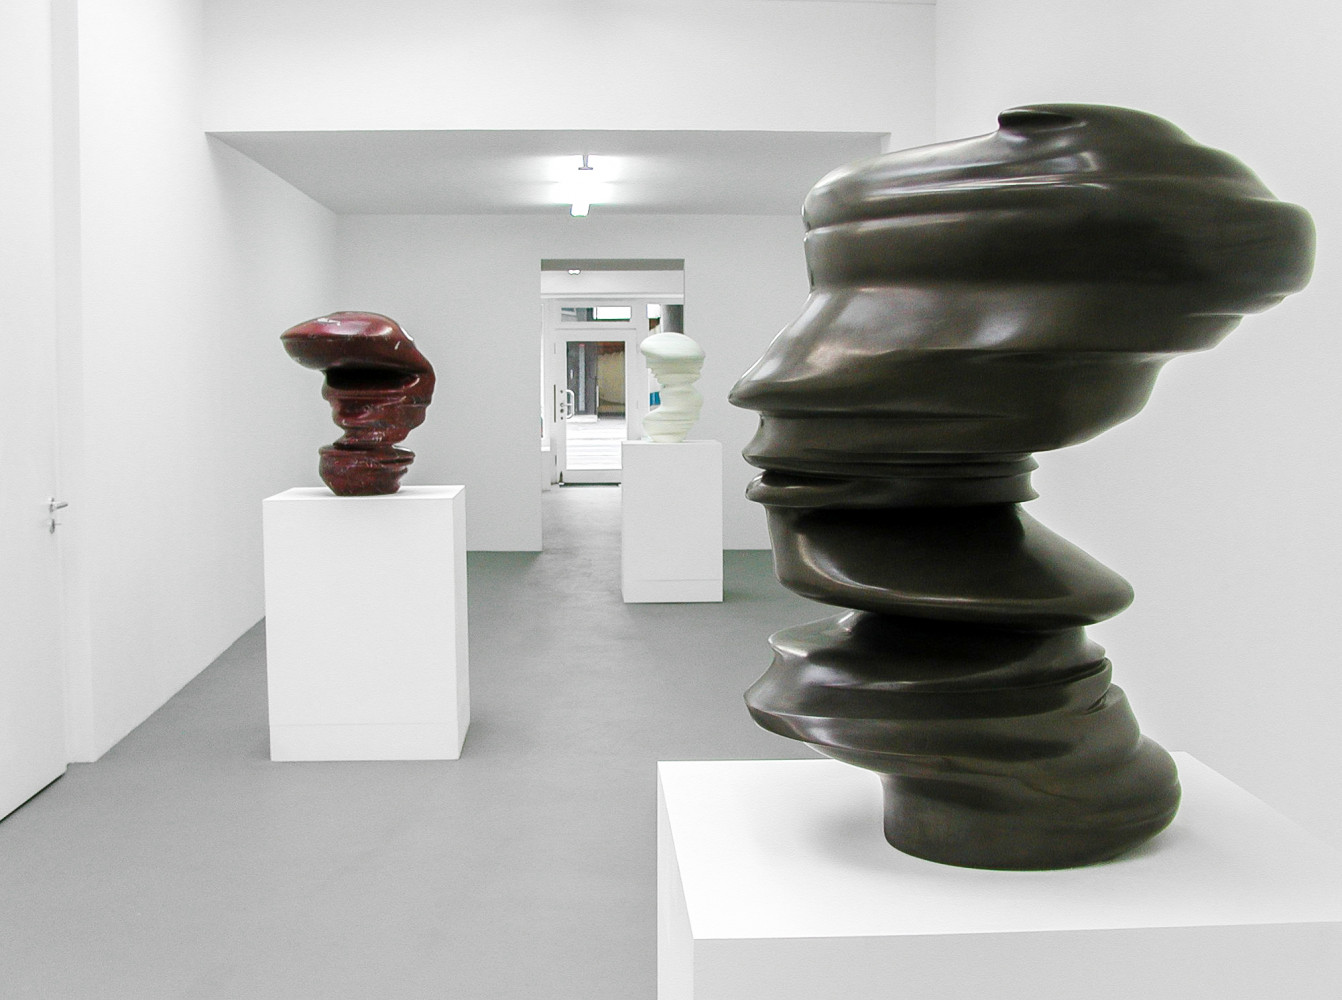 Tony Cragg, 'Sculptures', Installation view, 2002